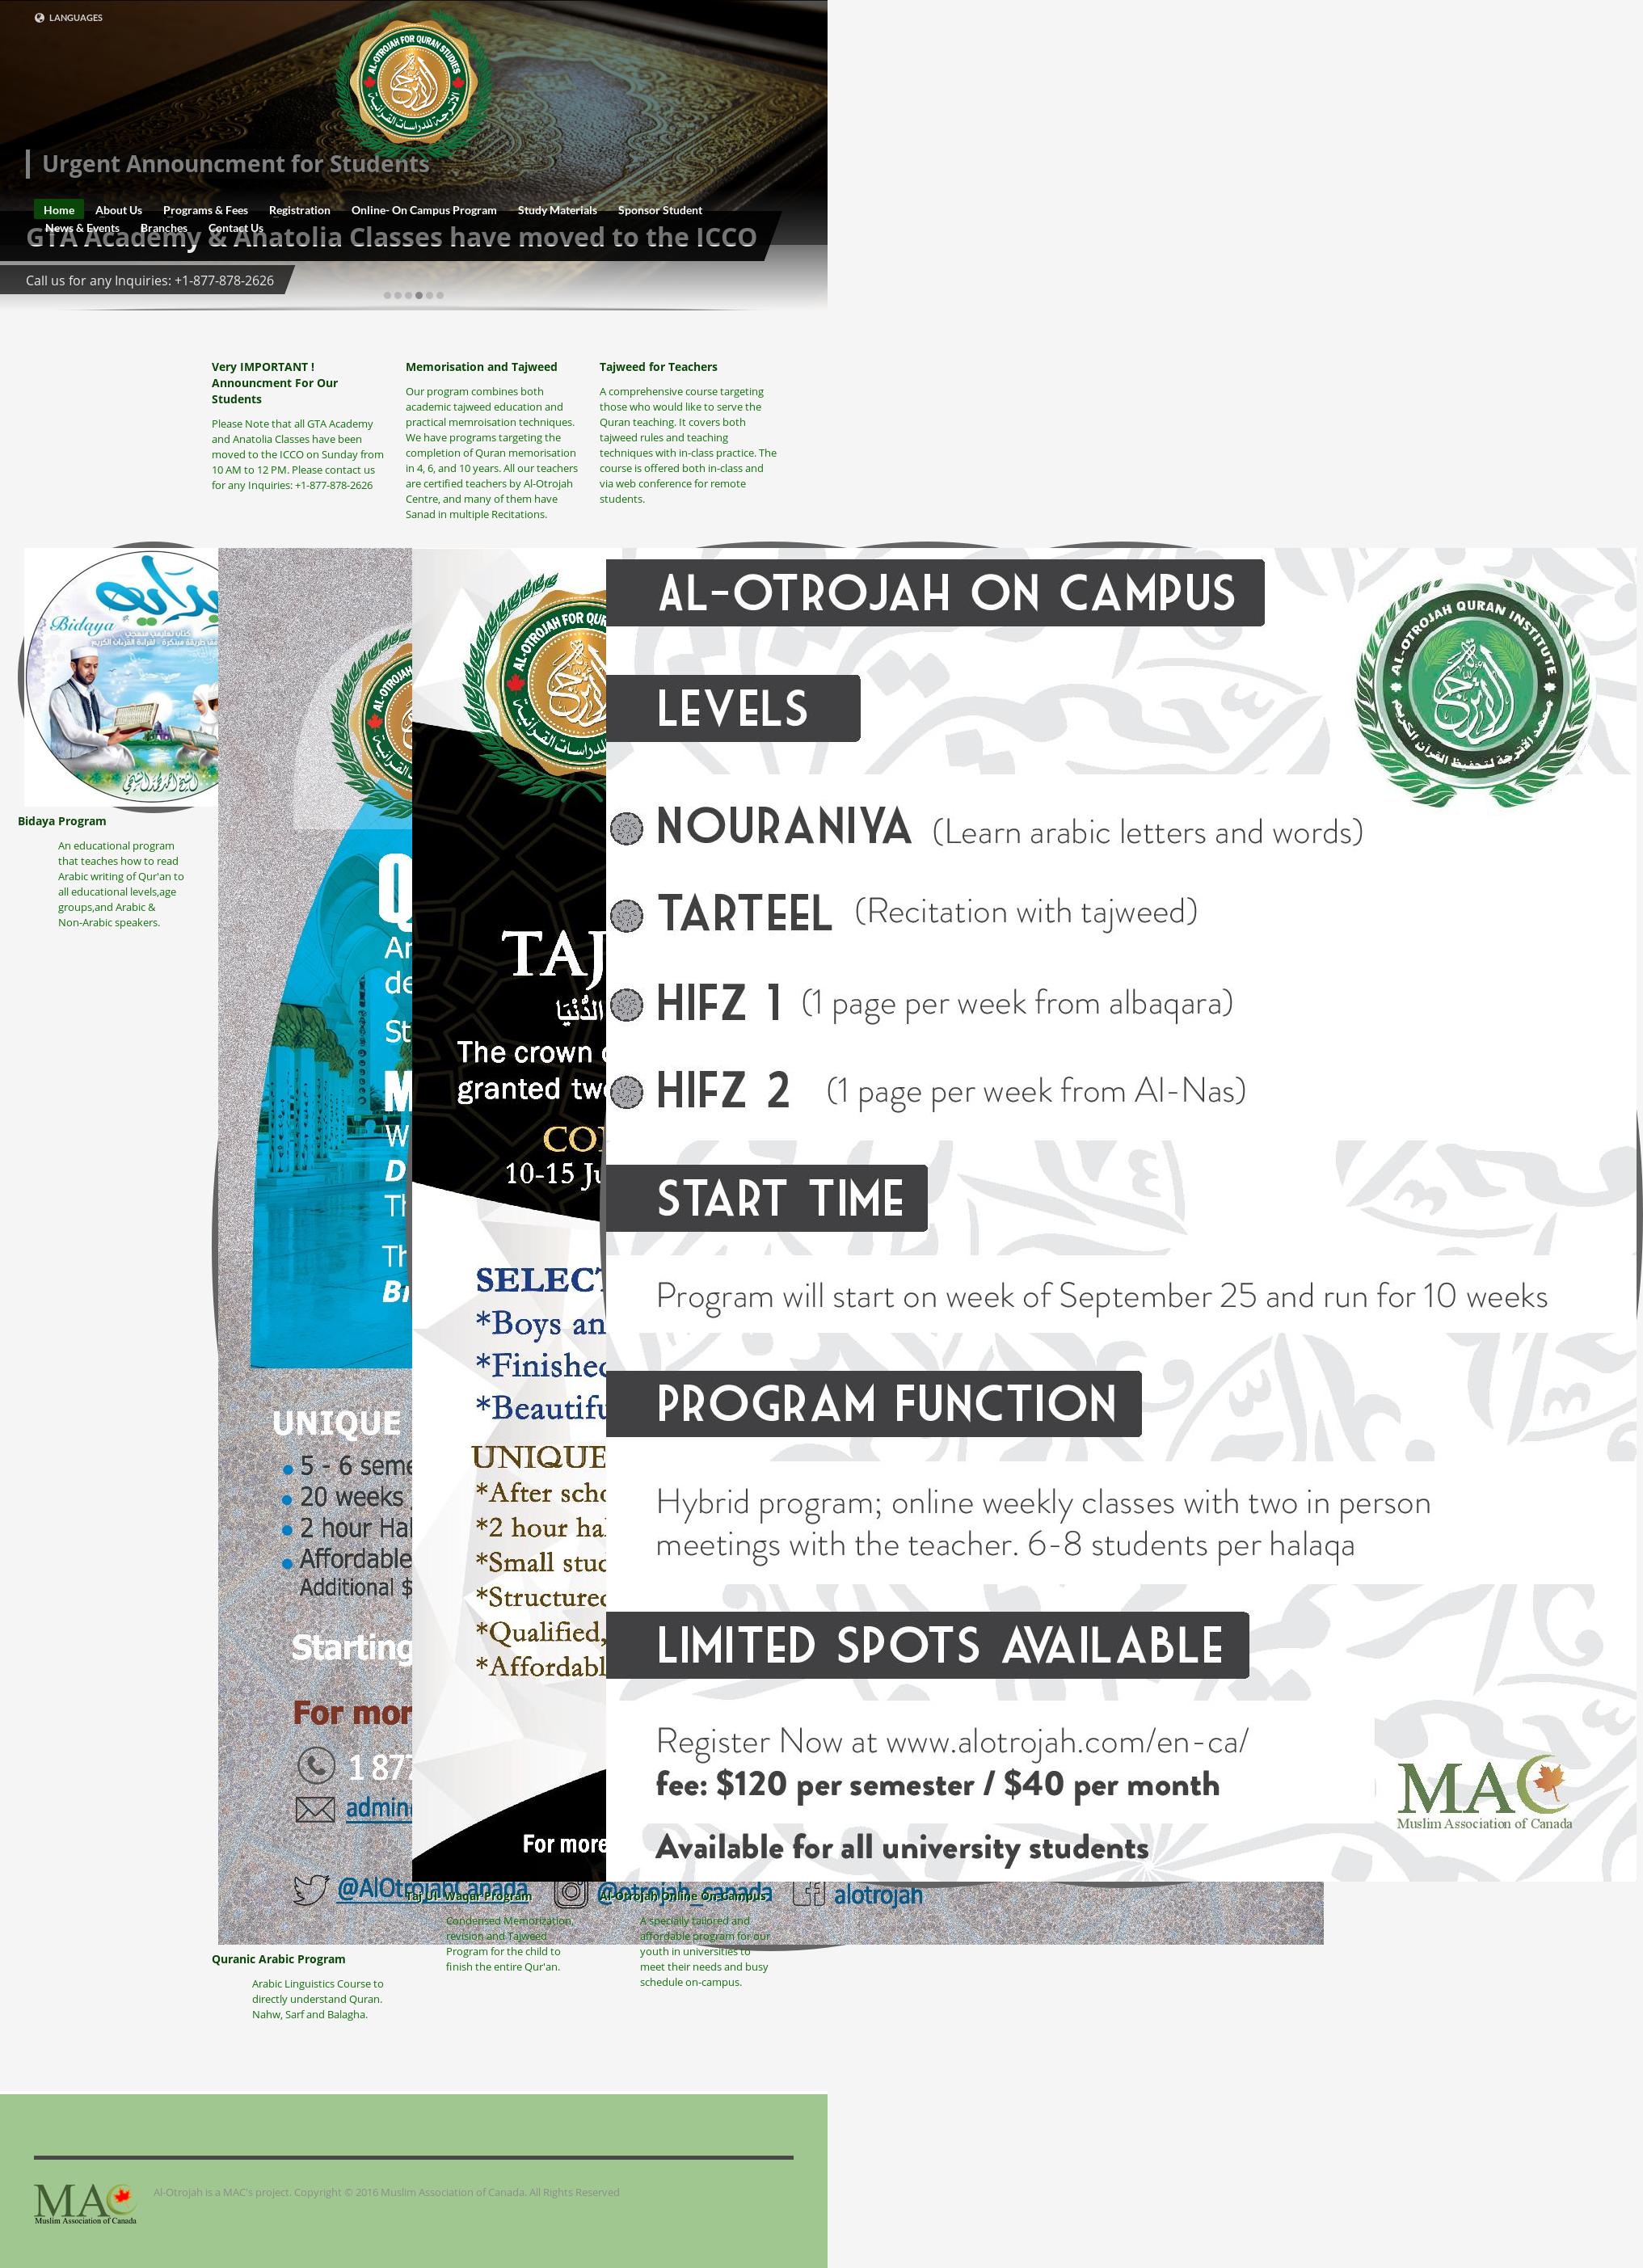 Al-otrojah Competitors, Revenue and Employees - Owler